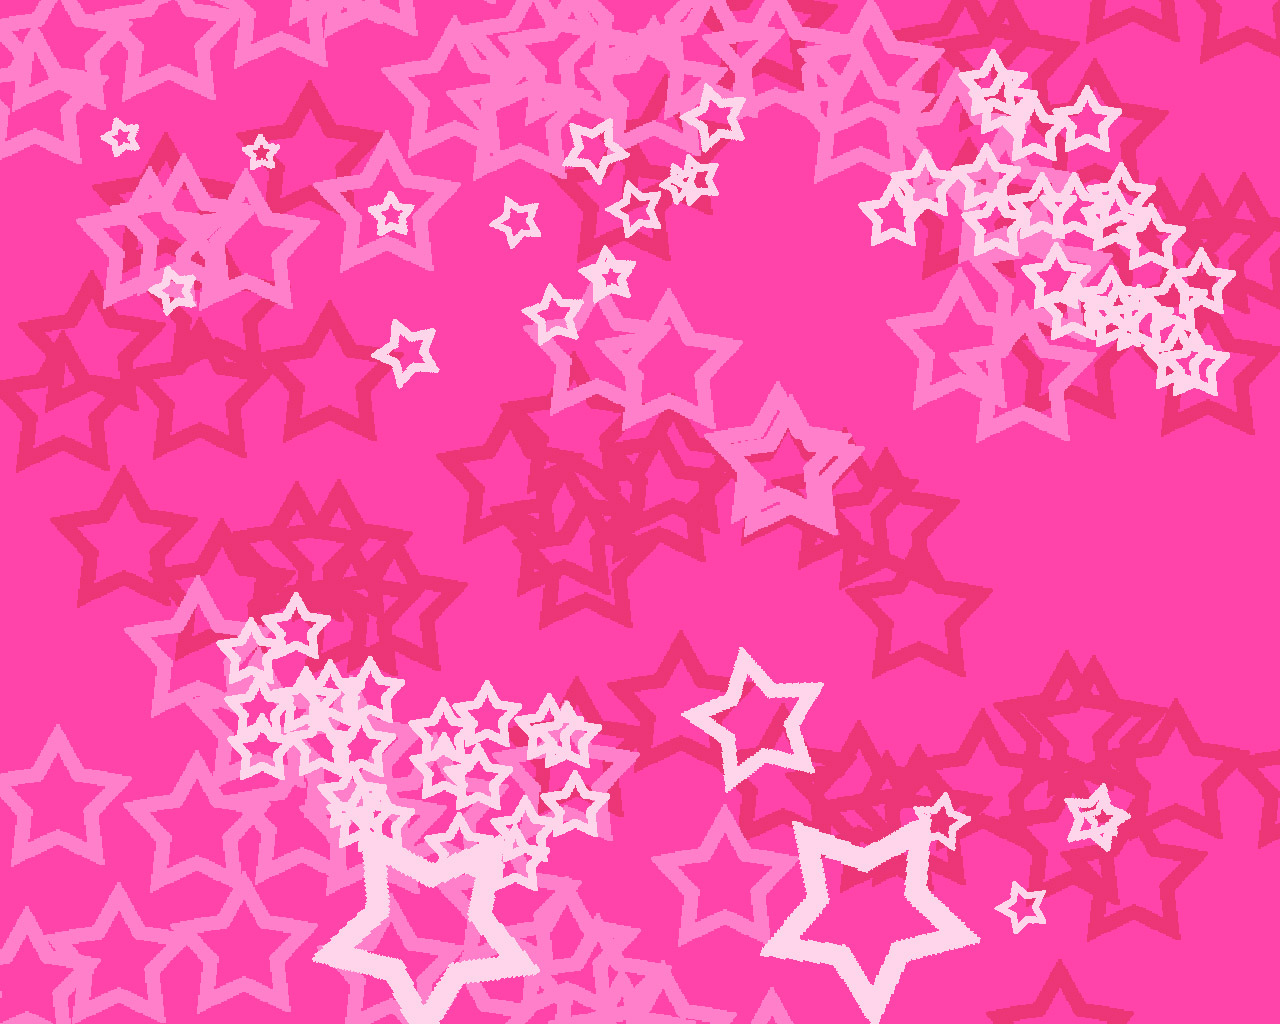 pink wallpaper pink wallpaper pink wallpaper pink wallpaper pink    Pink Girly Wallpaper